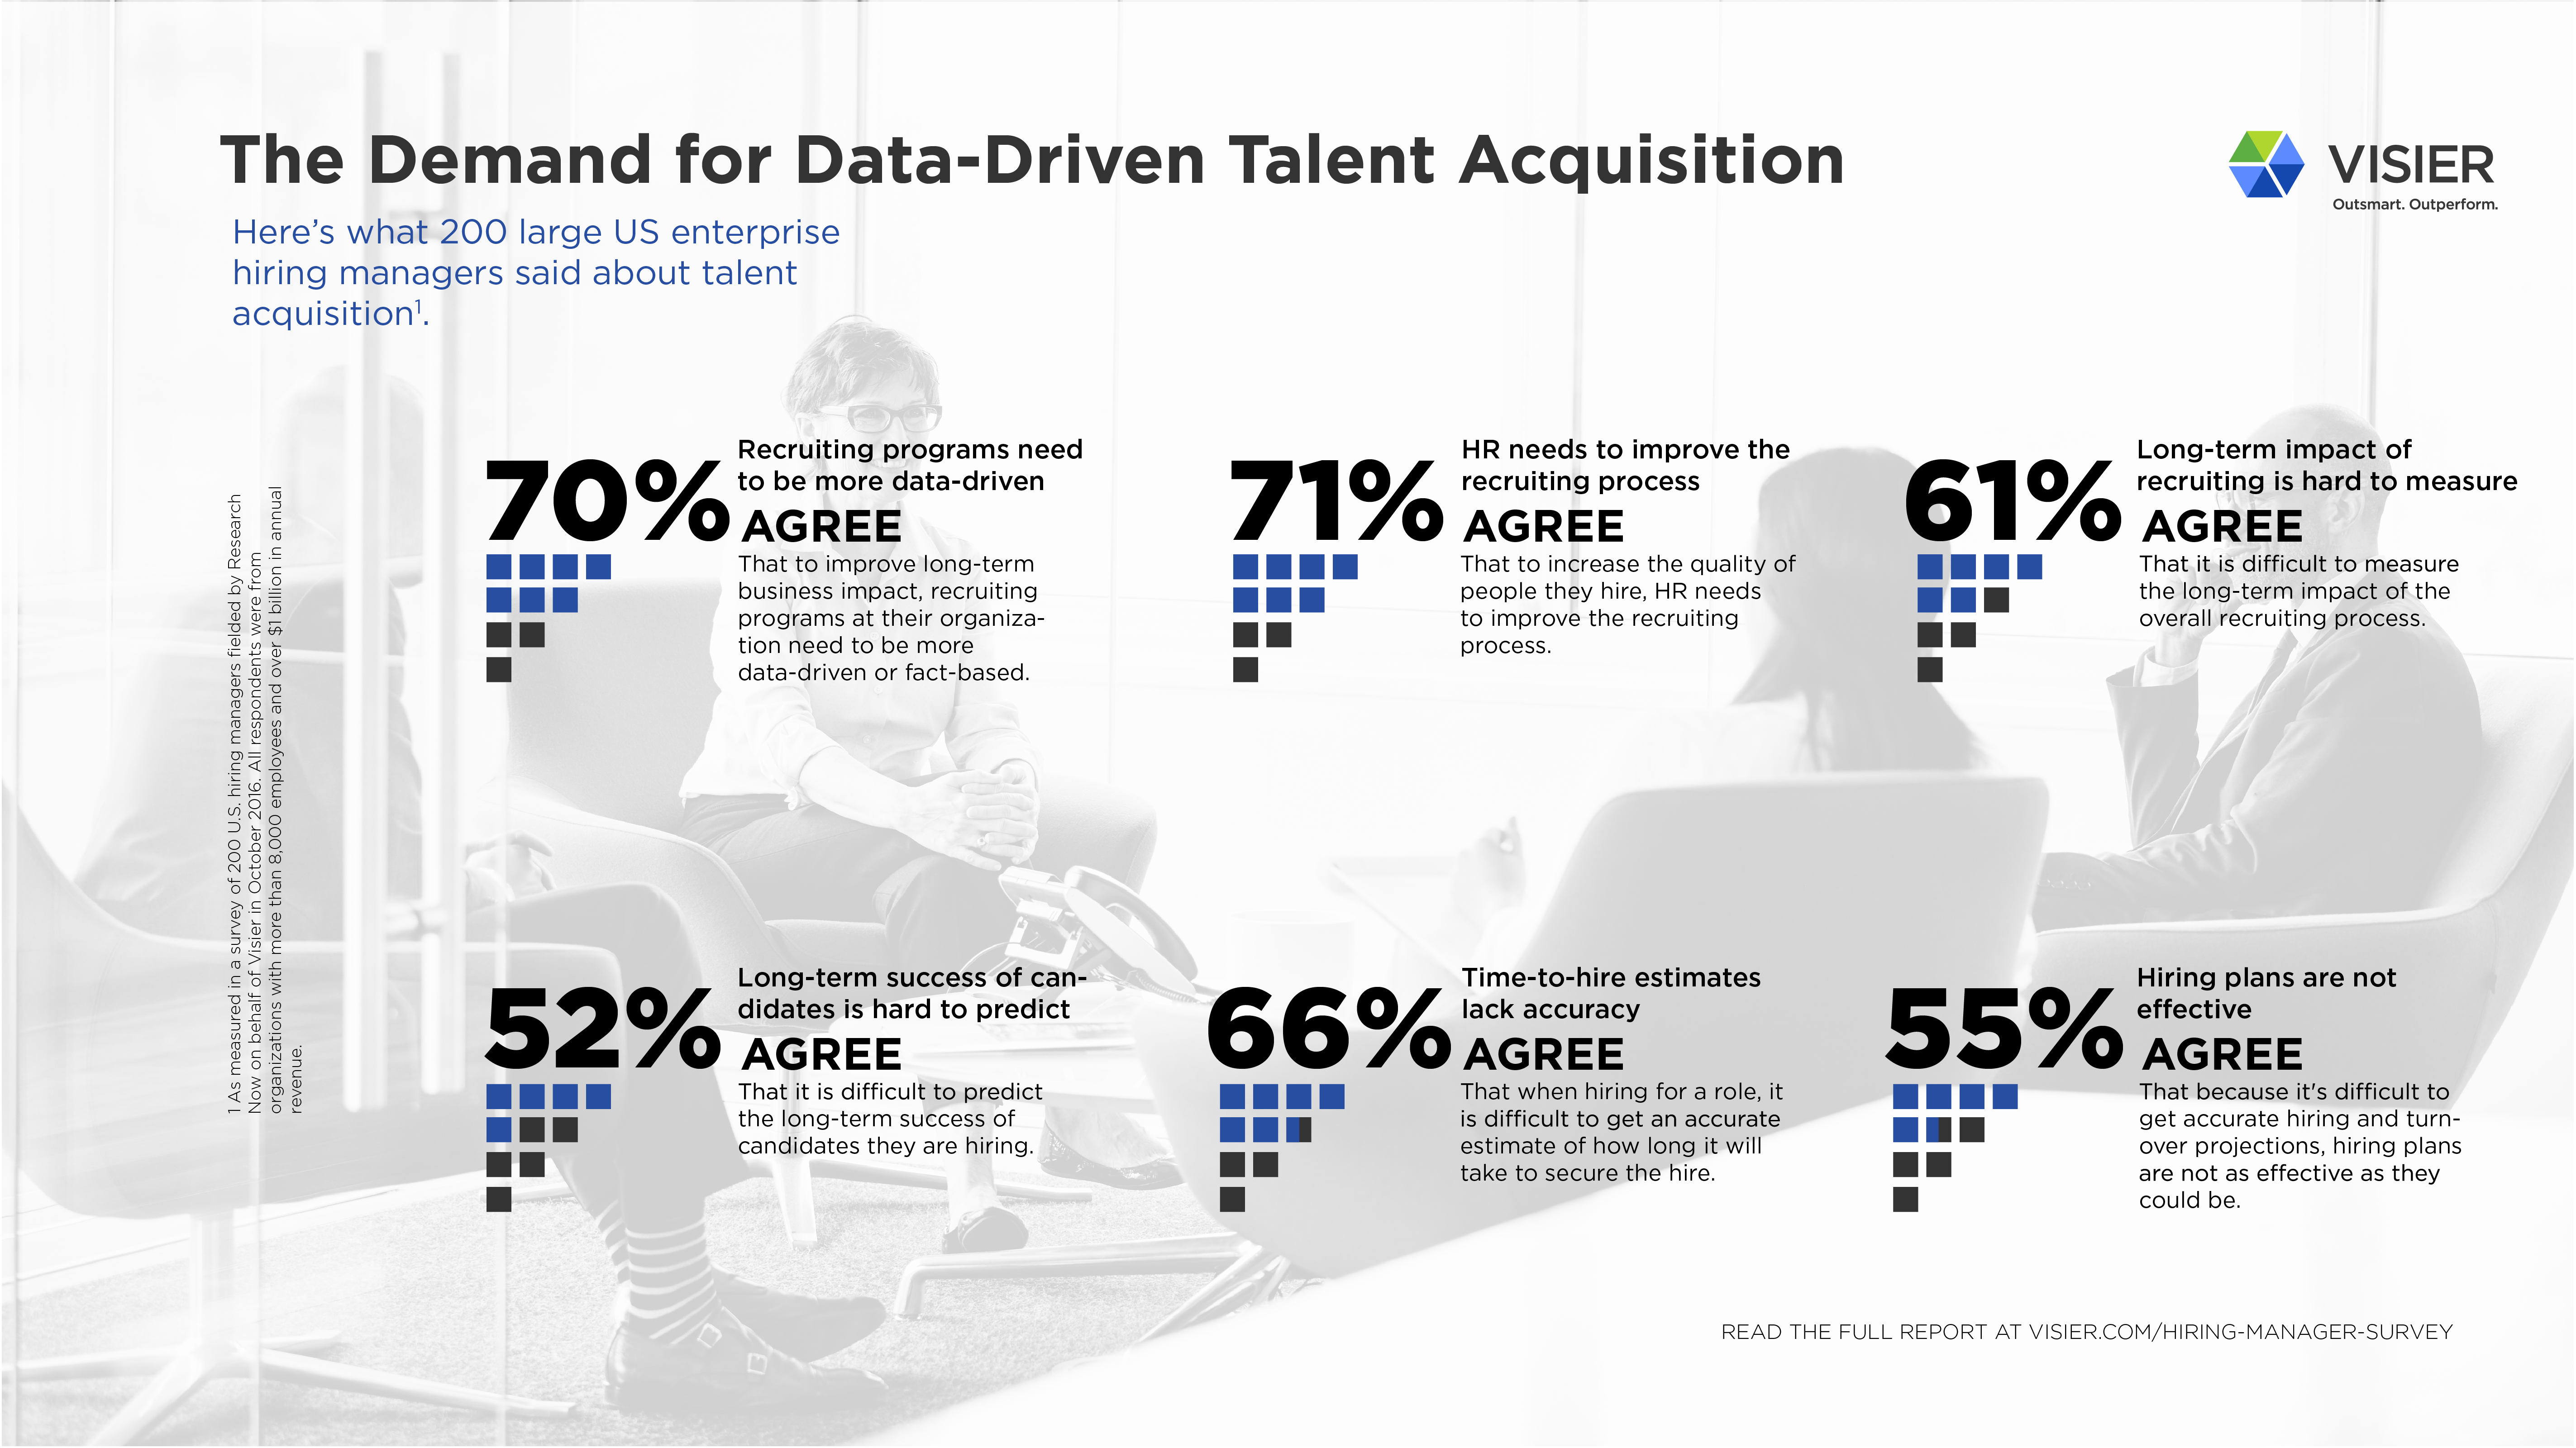 demand-for-data-driven-talent-acquisition